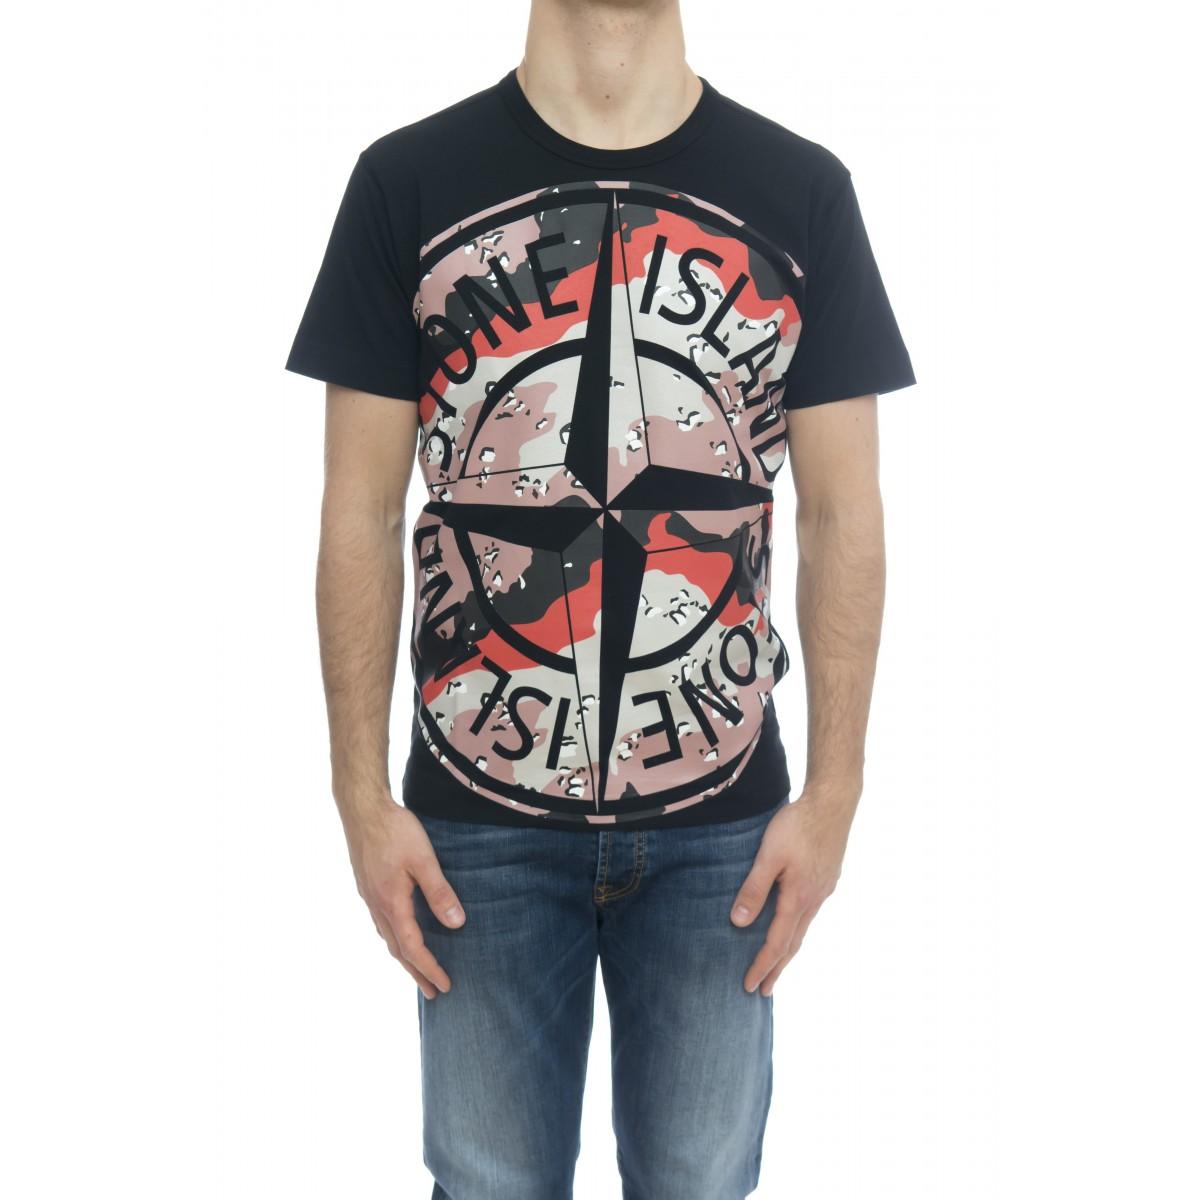 T-shirt - 23386 t-shirt logo camu